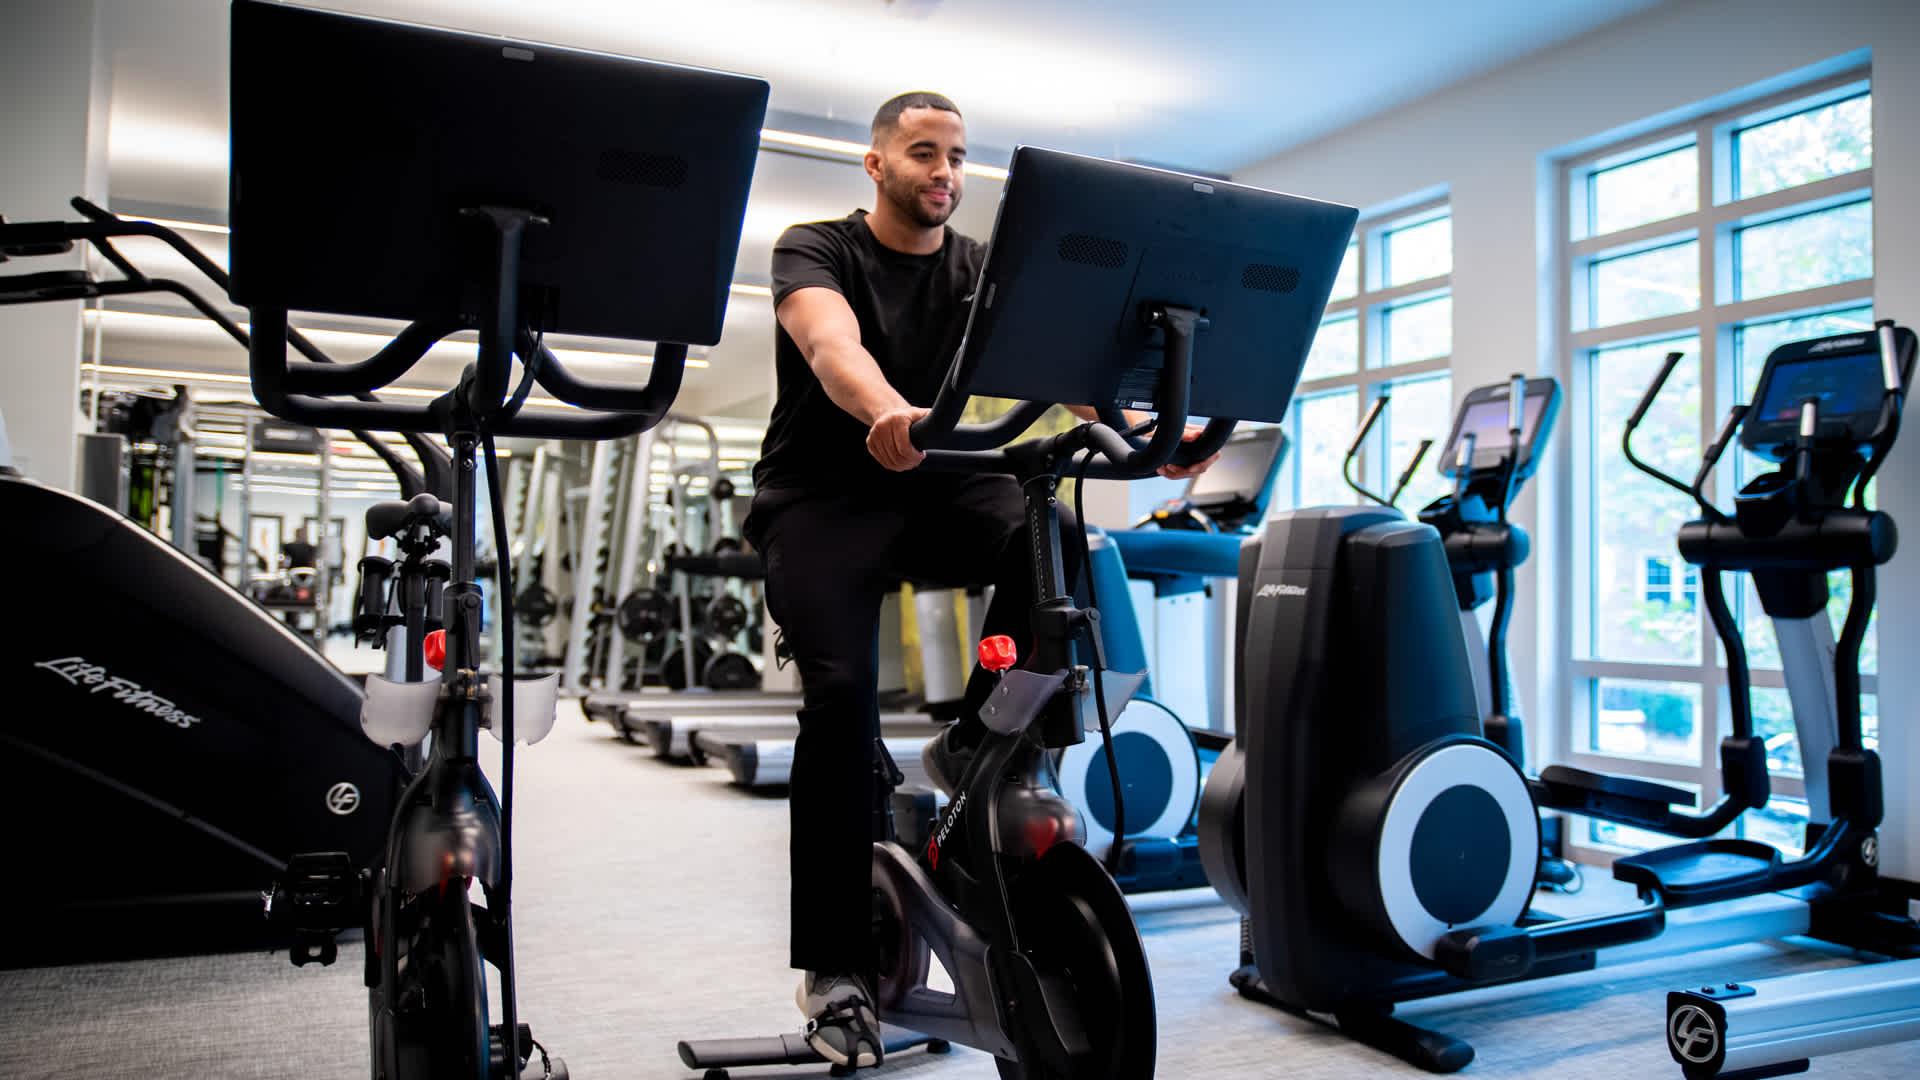 24 Hour Fitness Center with Peloton Bikes